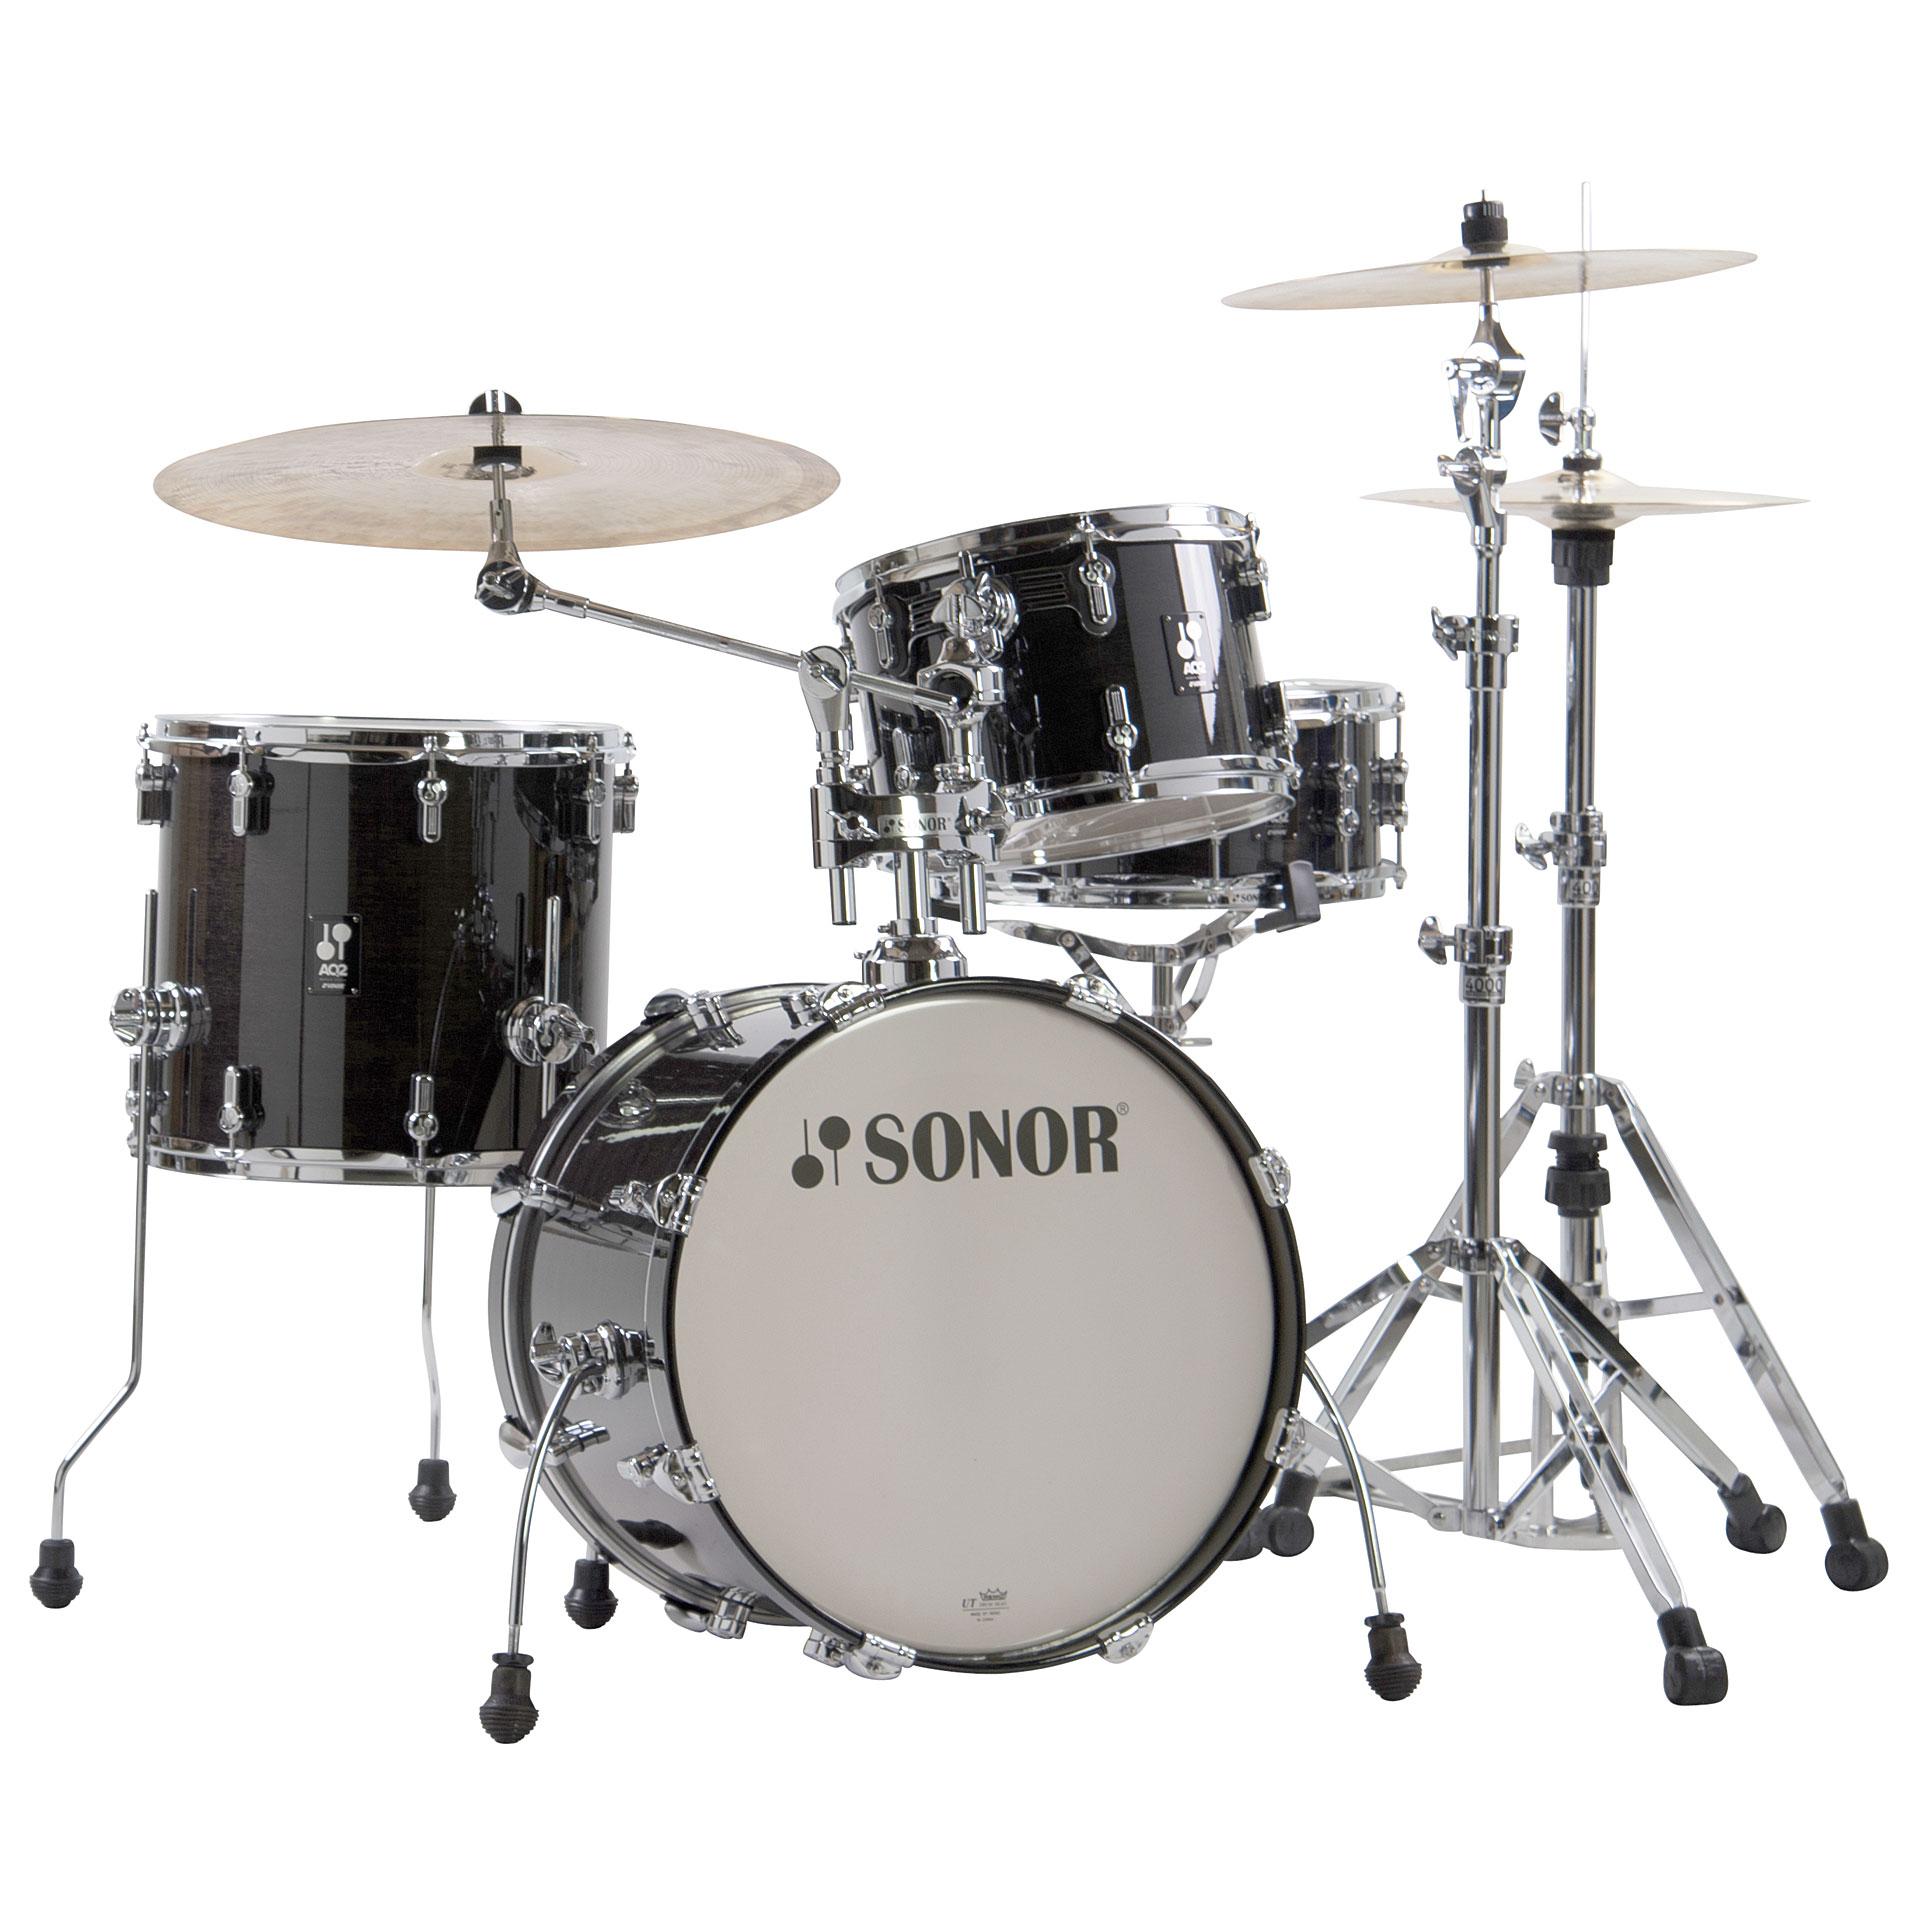 Schlagzeug Sonor AQ2 18 Transparent Black Bop Drumset